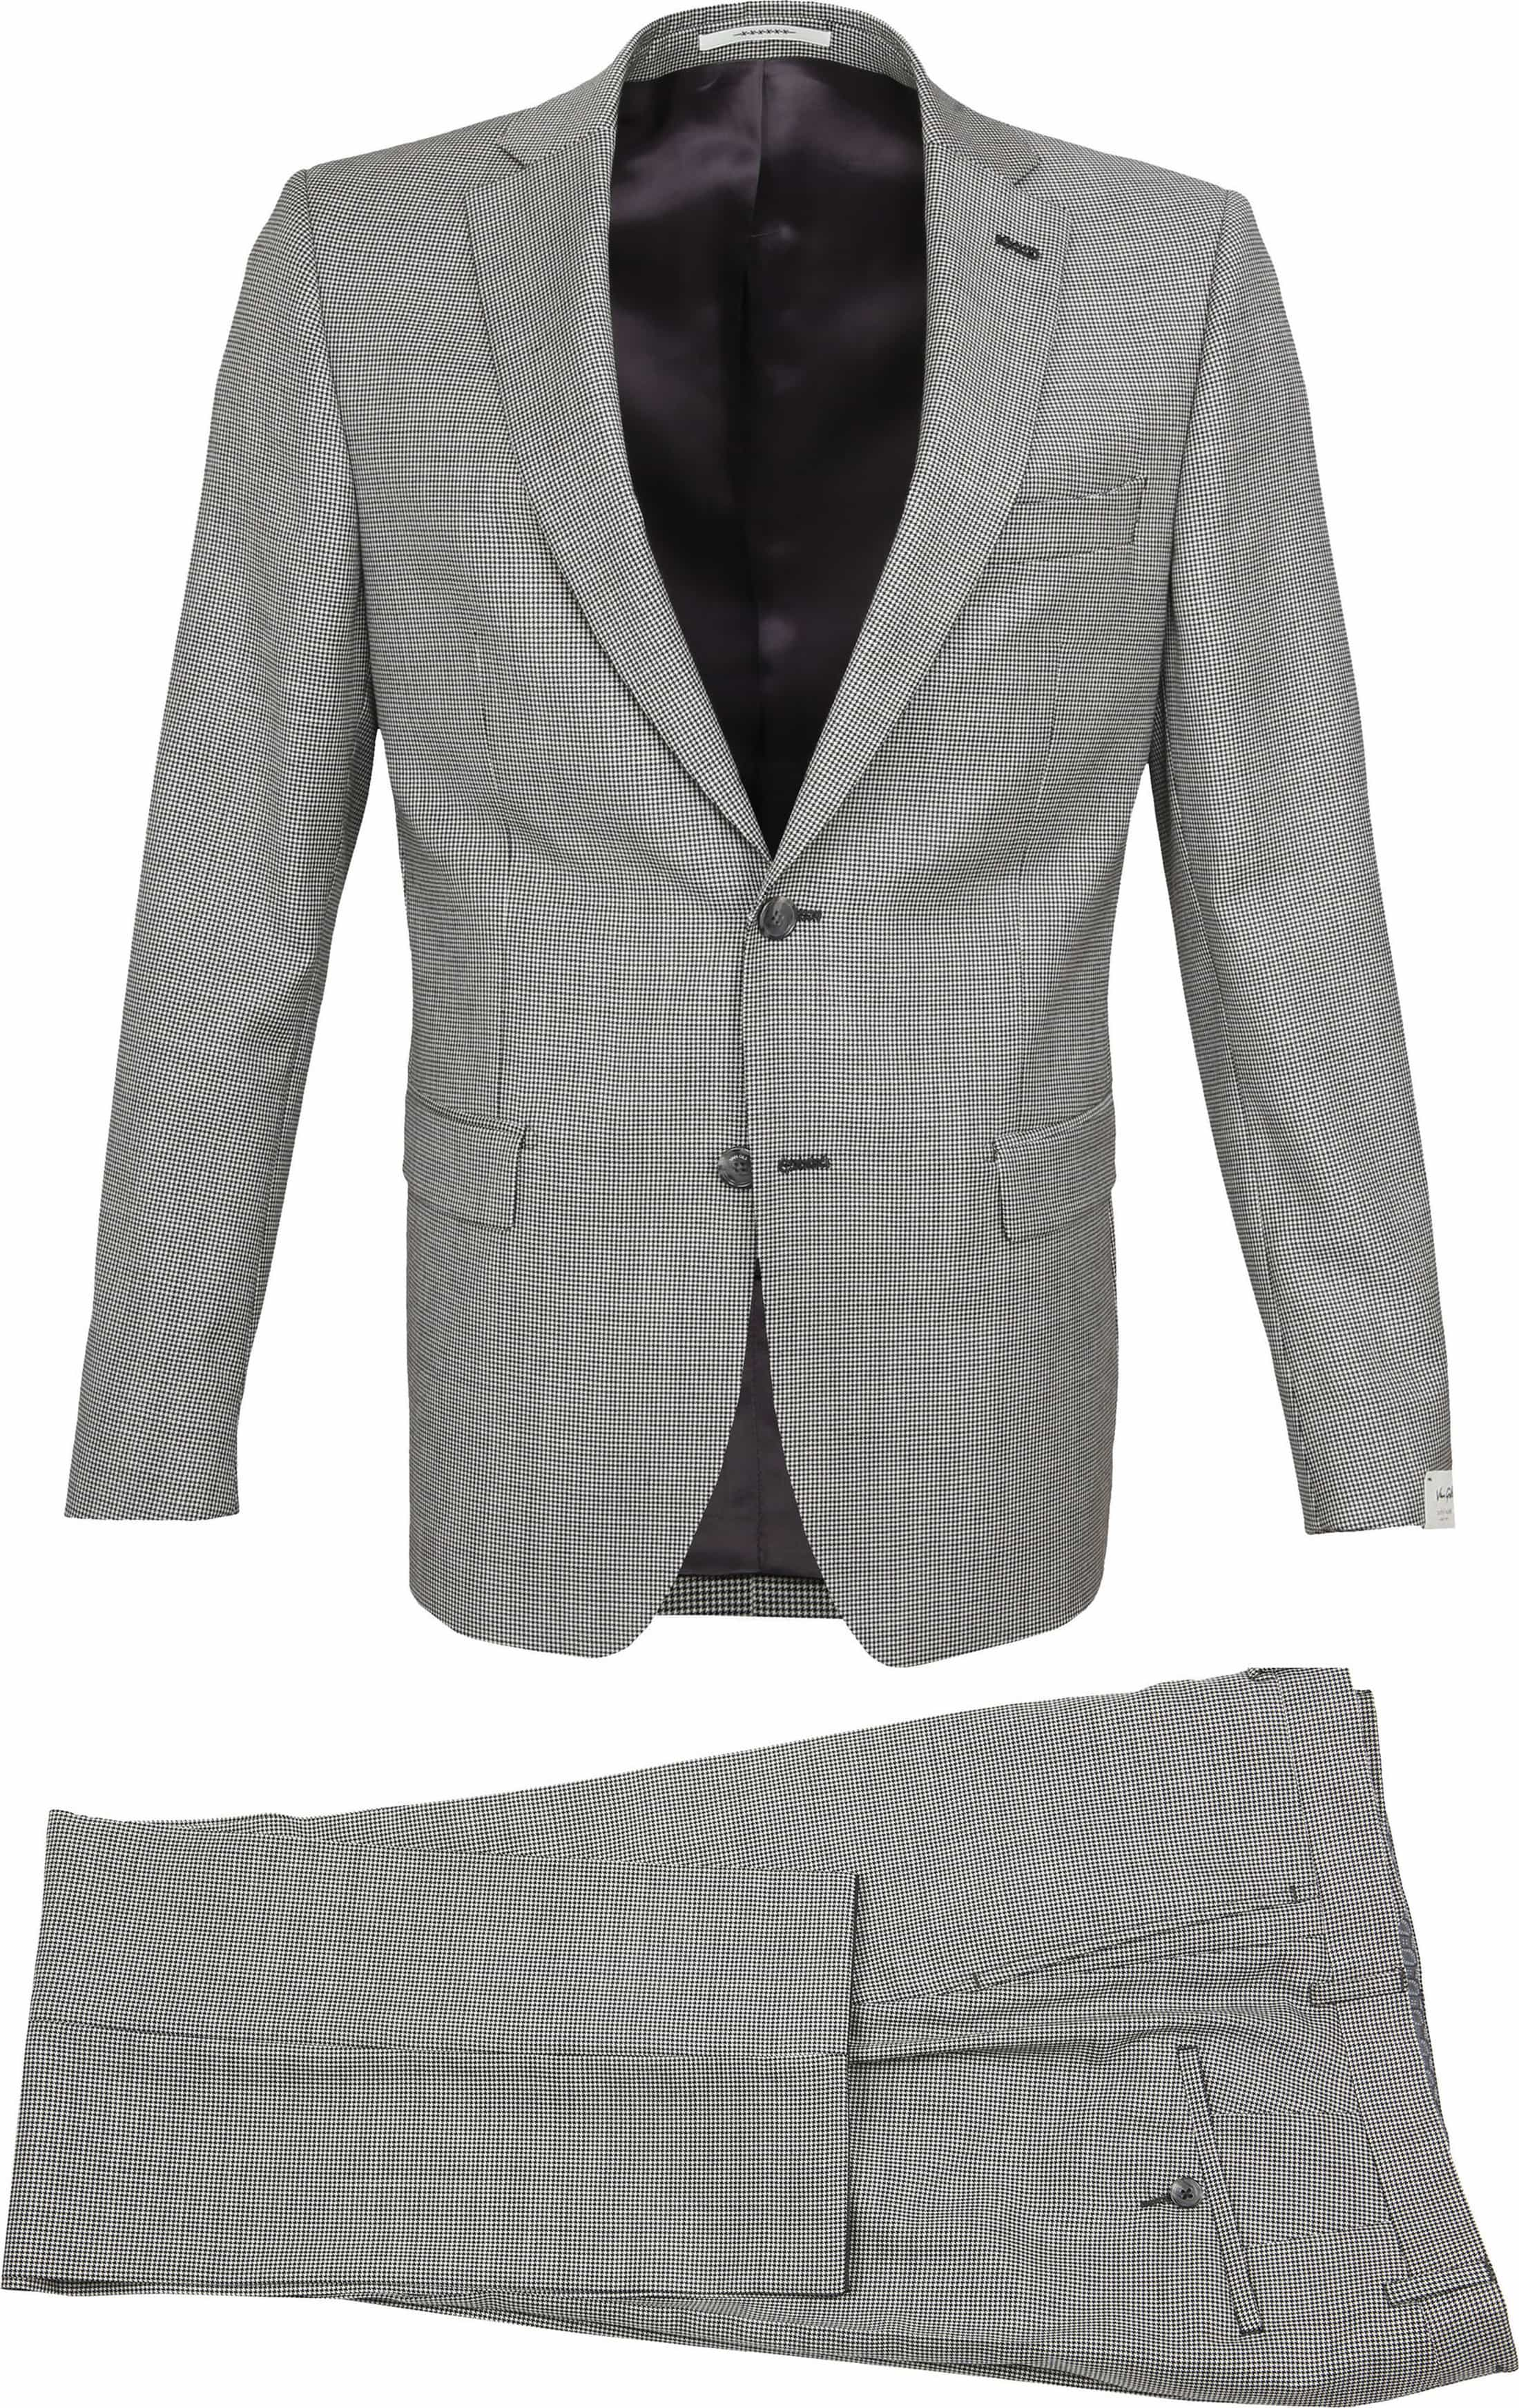 factory authentic d5f15 17252 Van Gils Ellis Buck Anzug W09212-80 online kaufen | Suitable